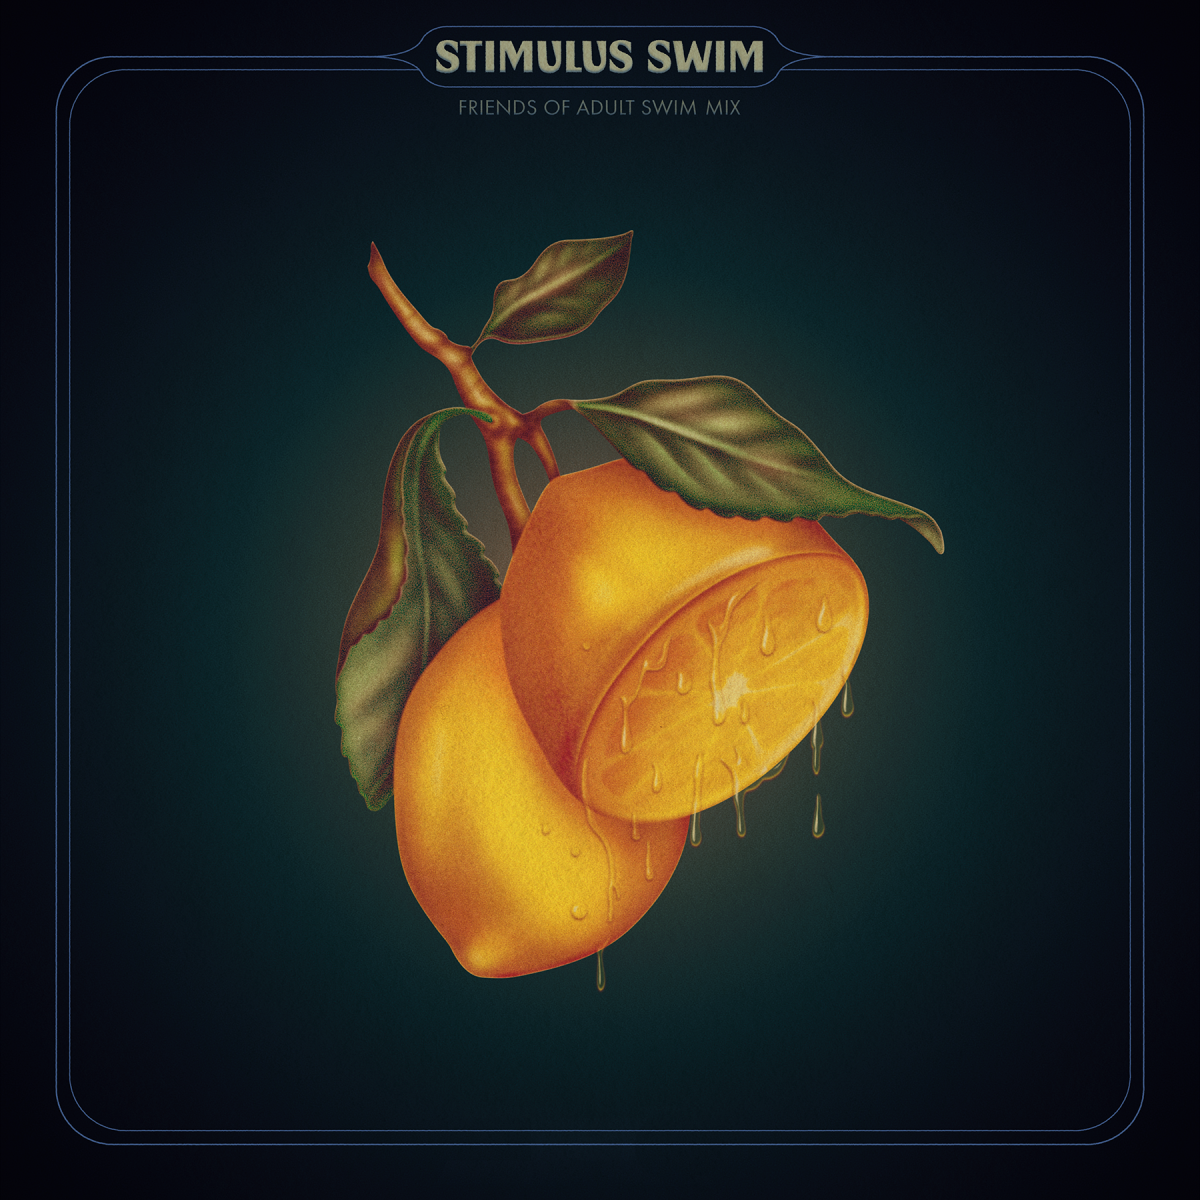 Adult Swim Stimulus Swim